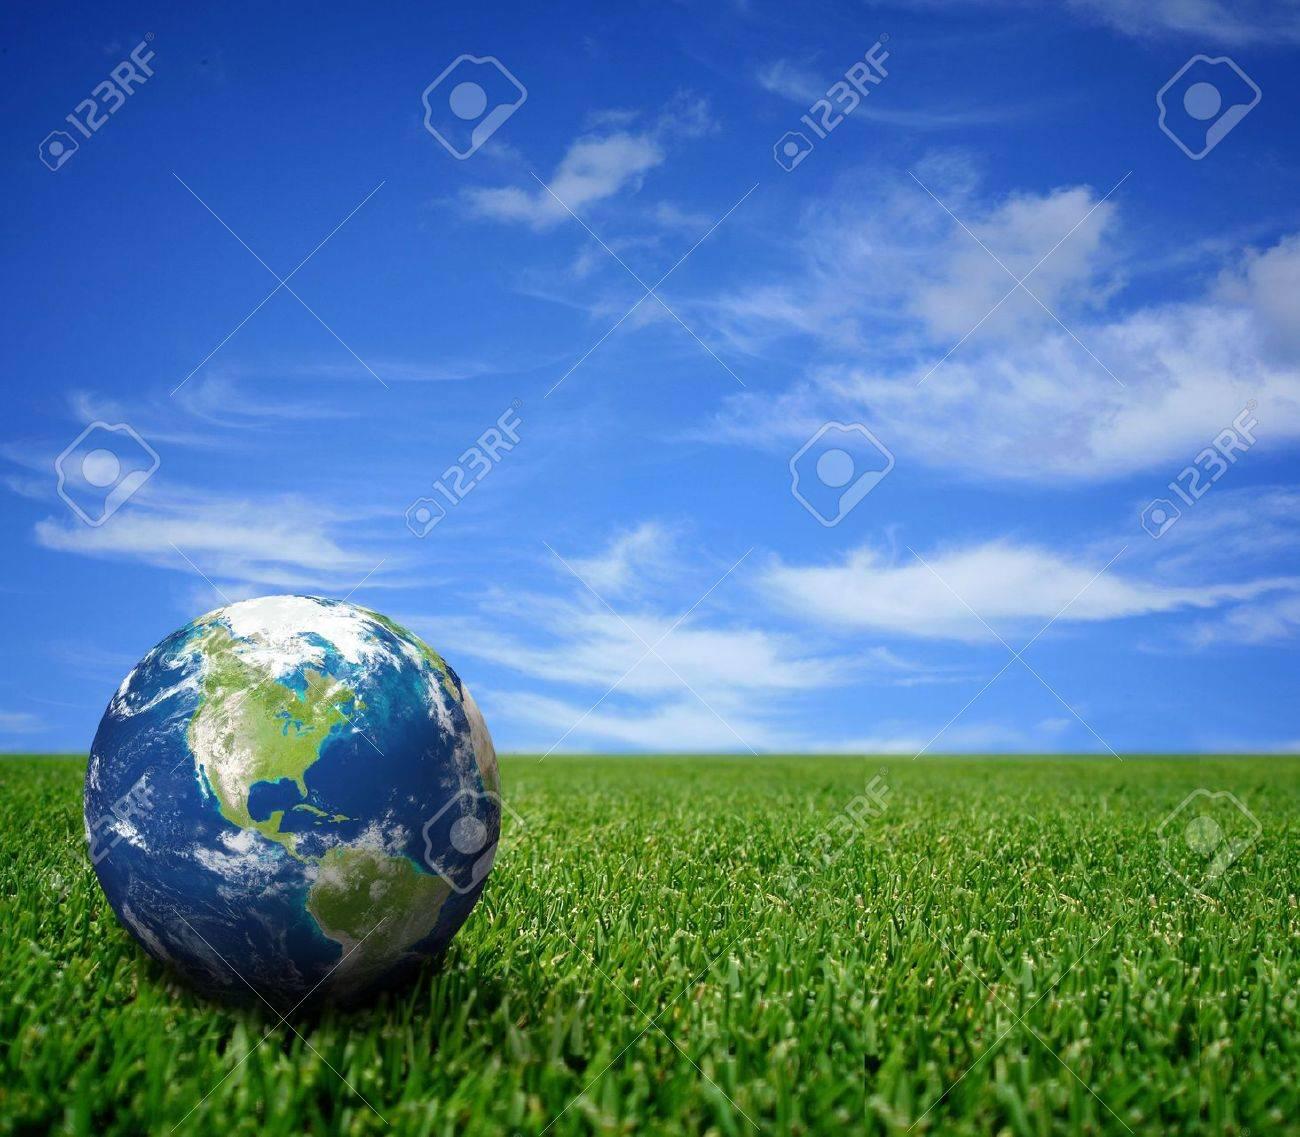 Landscape with globe Stock Photo - 5856059